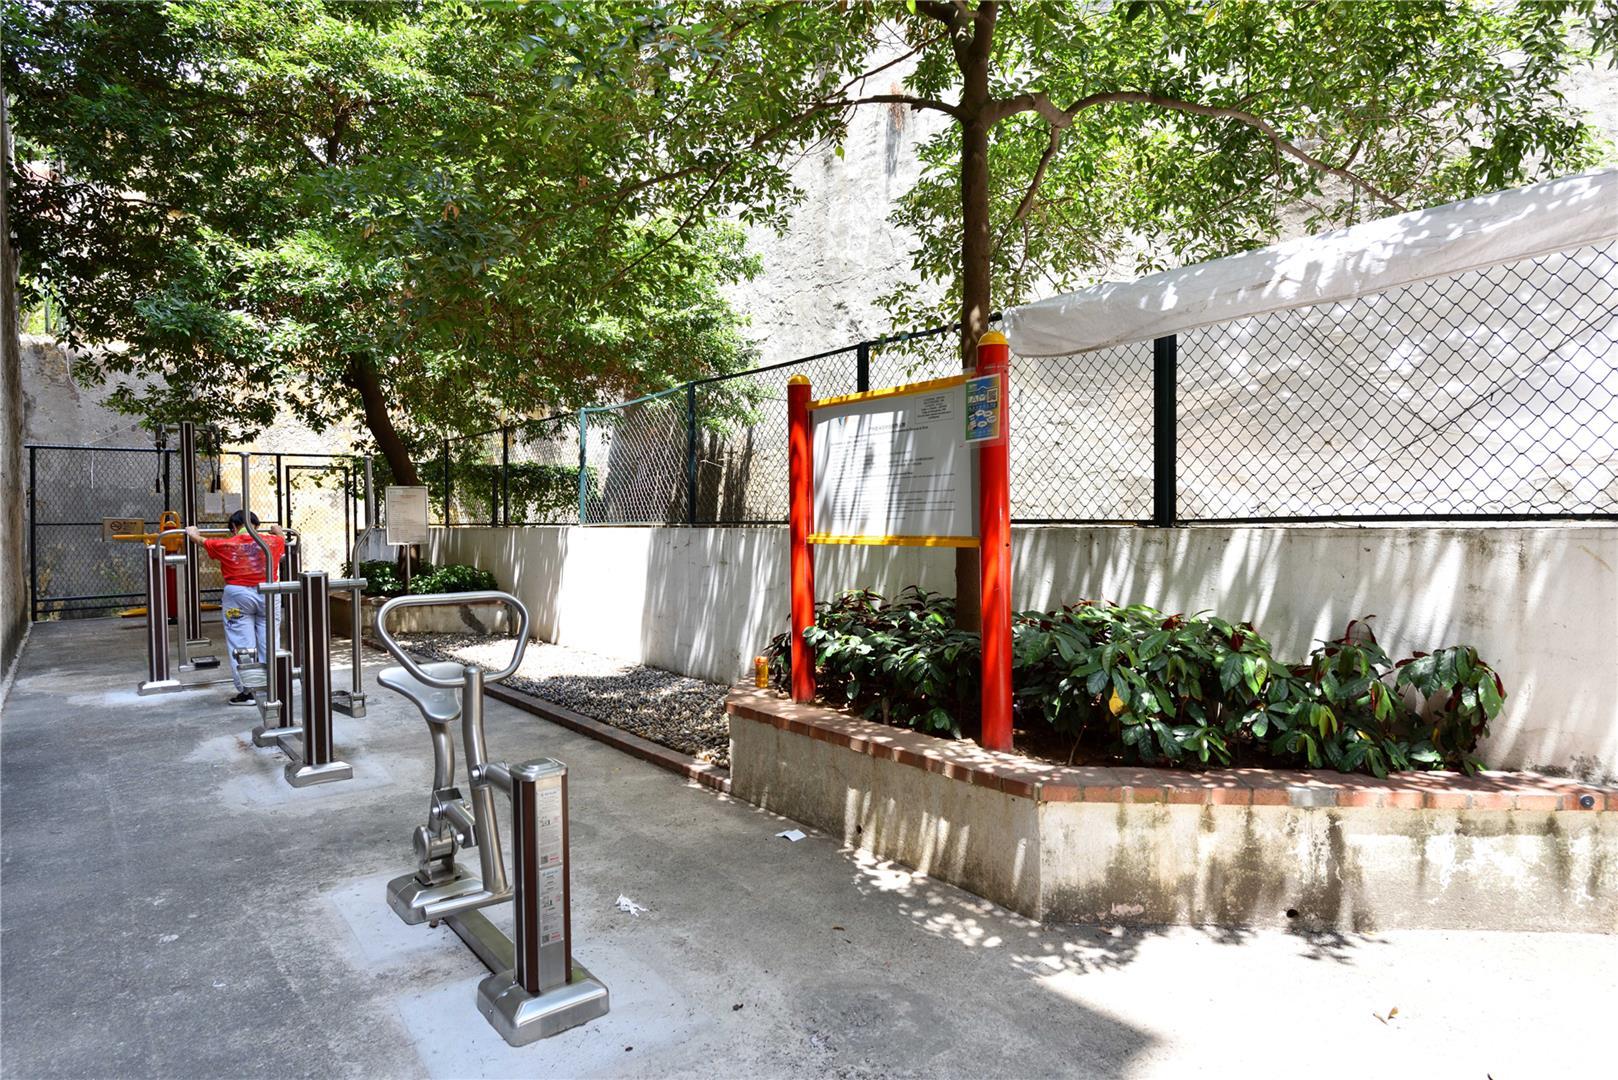 Temporary Leisure Area in Travessa de Chan Loc